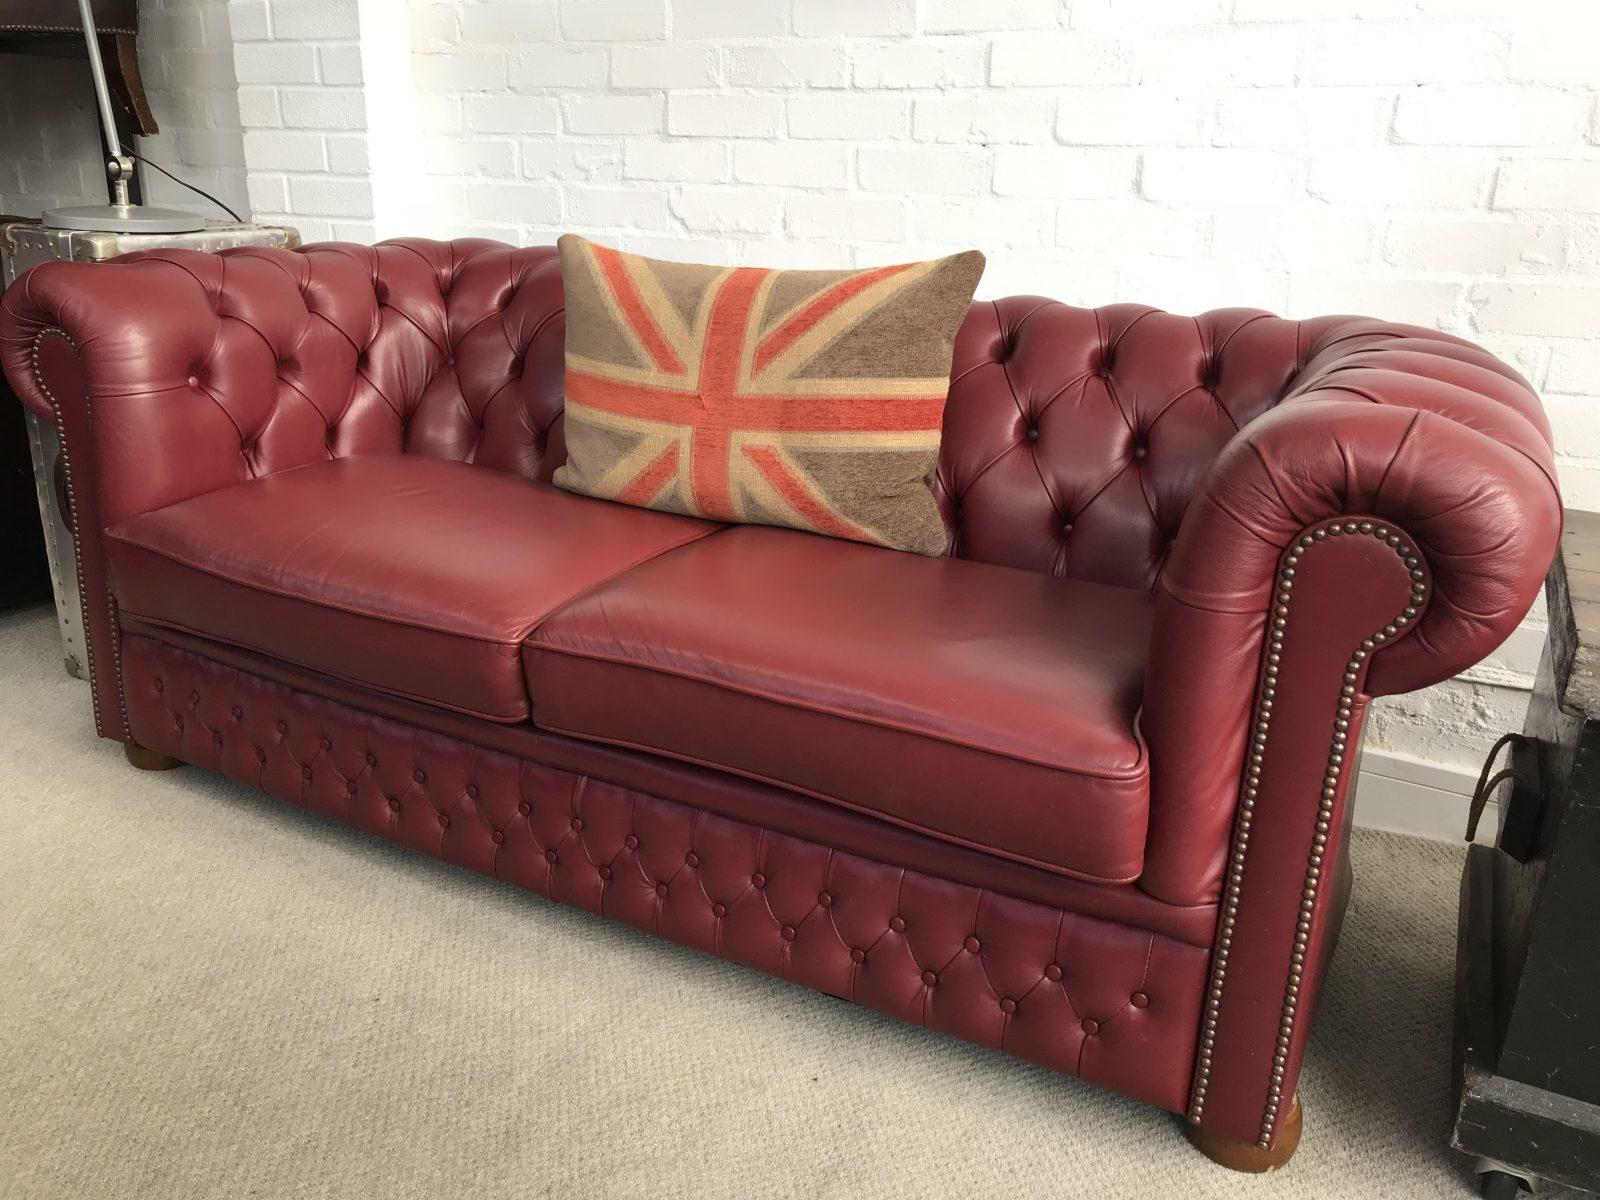 Ordinaire Stunning Burgundy 3 Seater Chesterfield Sofa.